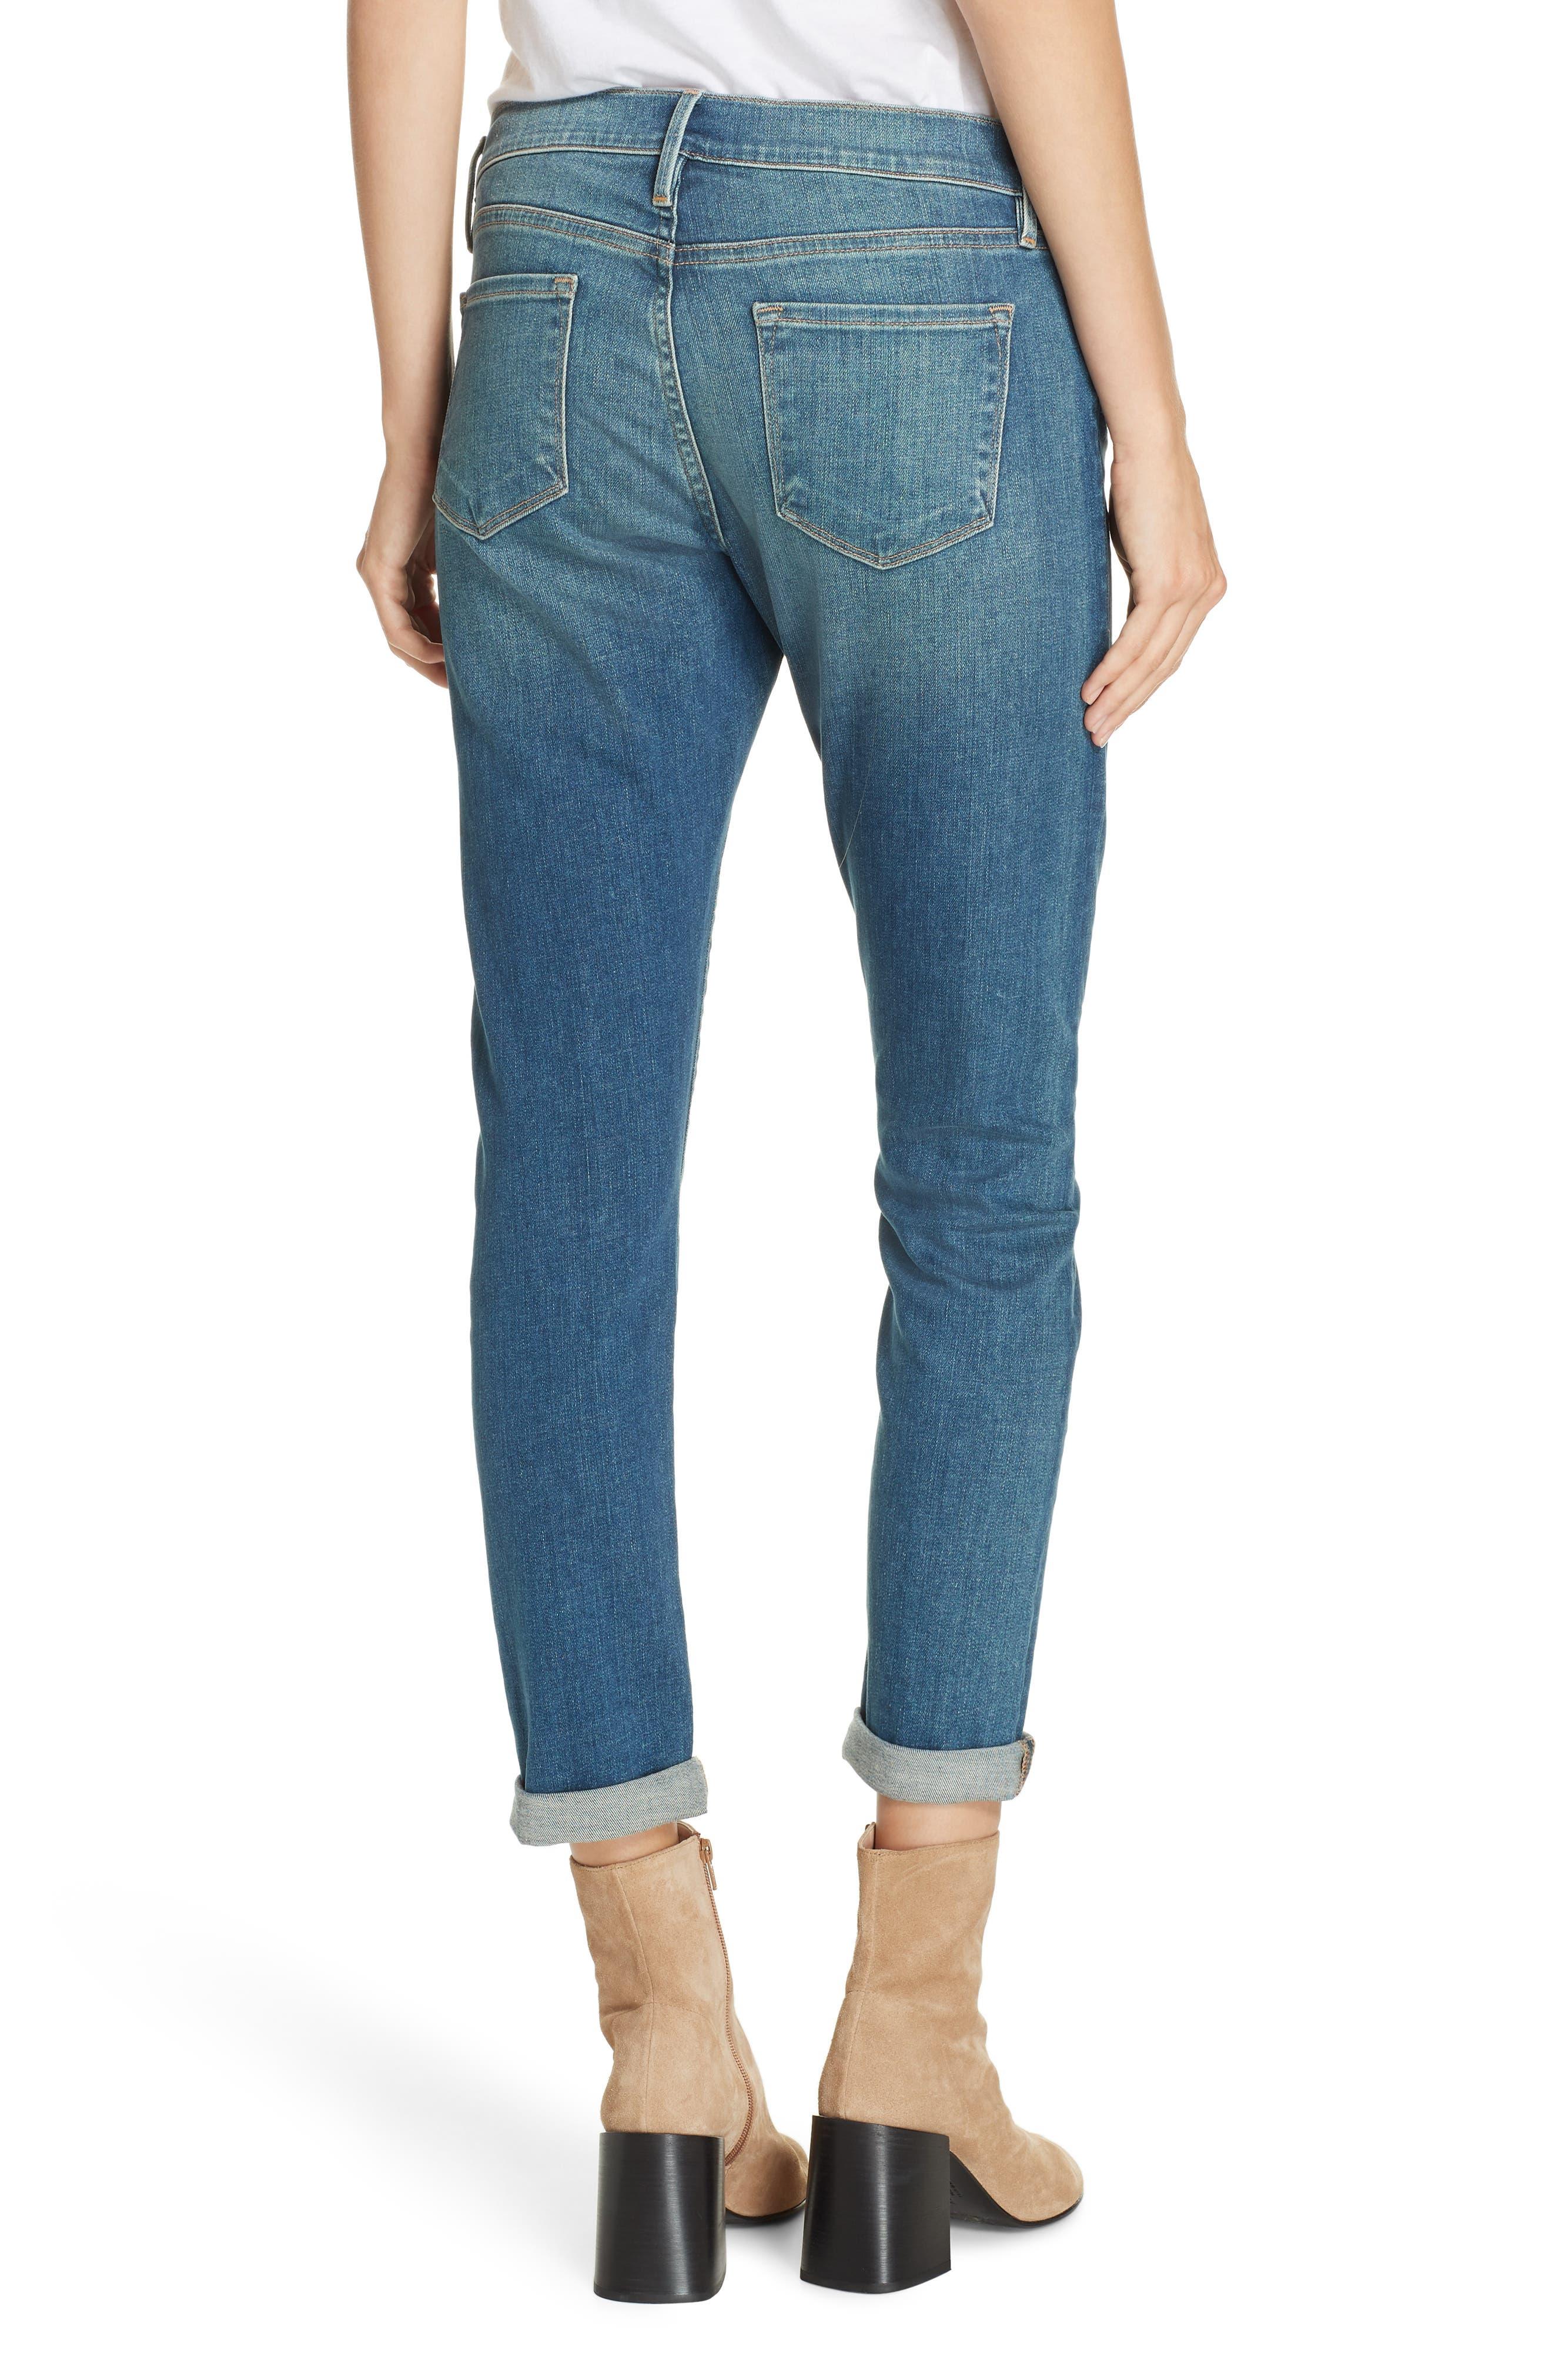 Le Garcon Slim Boyfriend Jeans,                             Alternate thumbnail 2, color,                             BERKLEY SQUARE